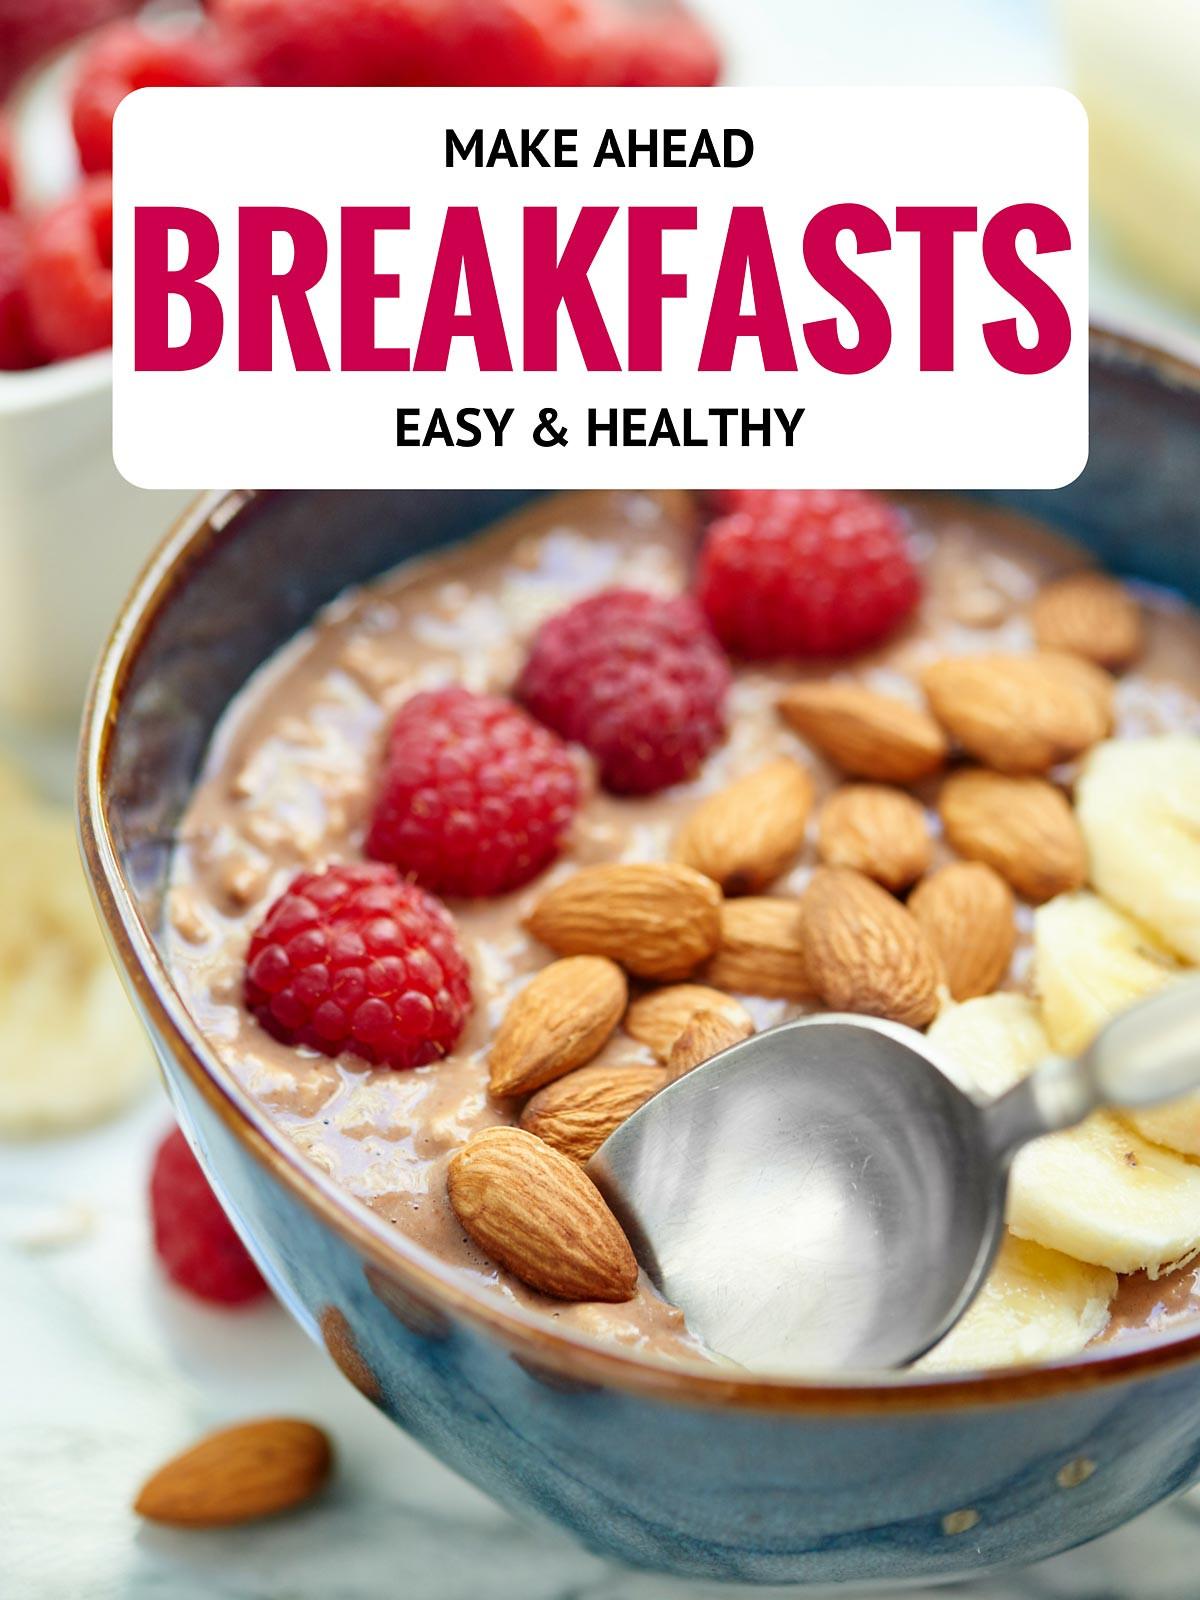 Healthy Breakfast Meals  Easy Healthy Make Ahead Breakfast Recipes Show Me the Yummy